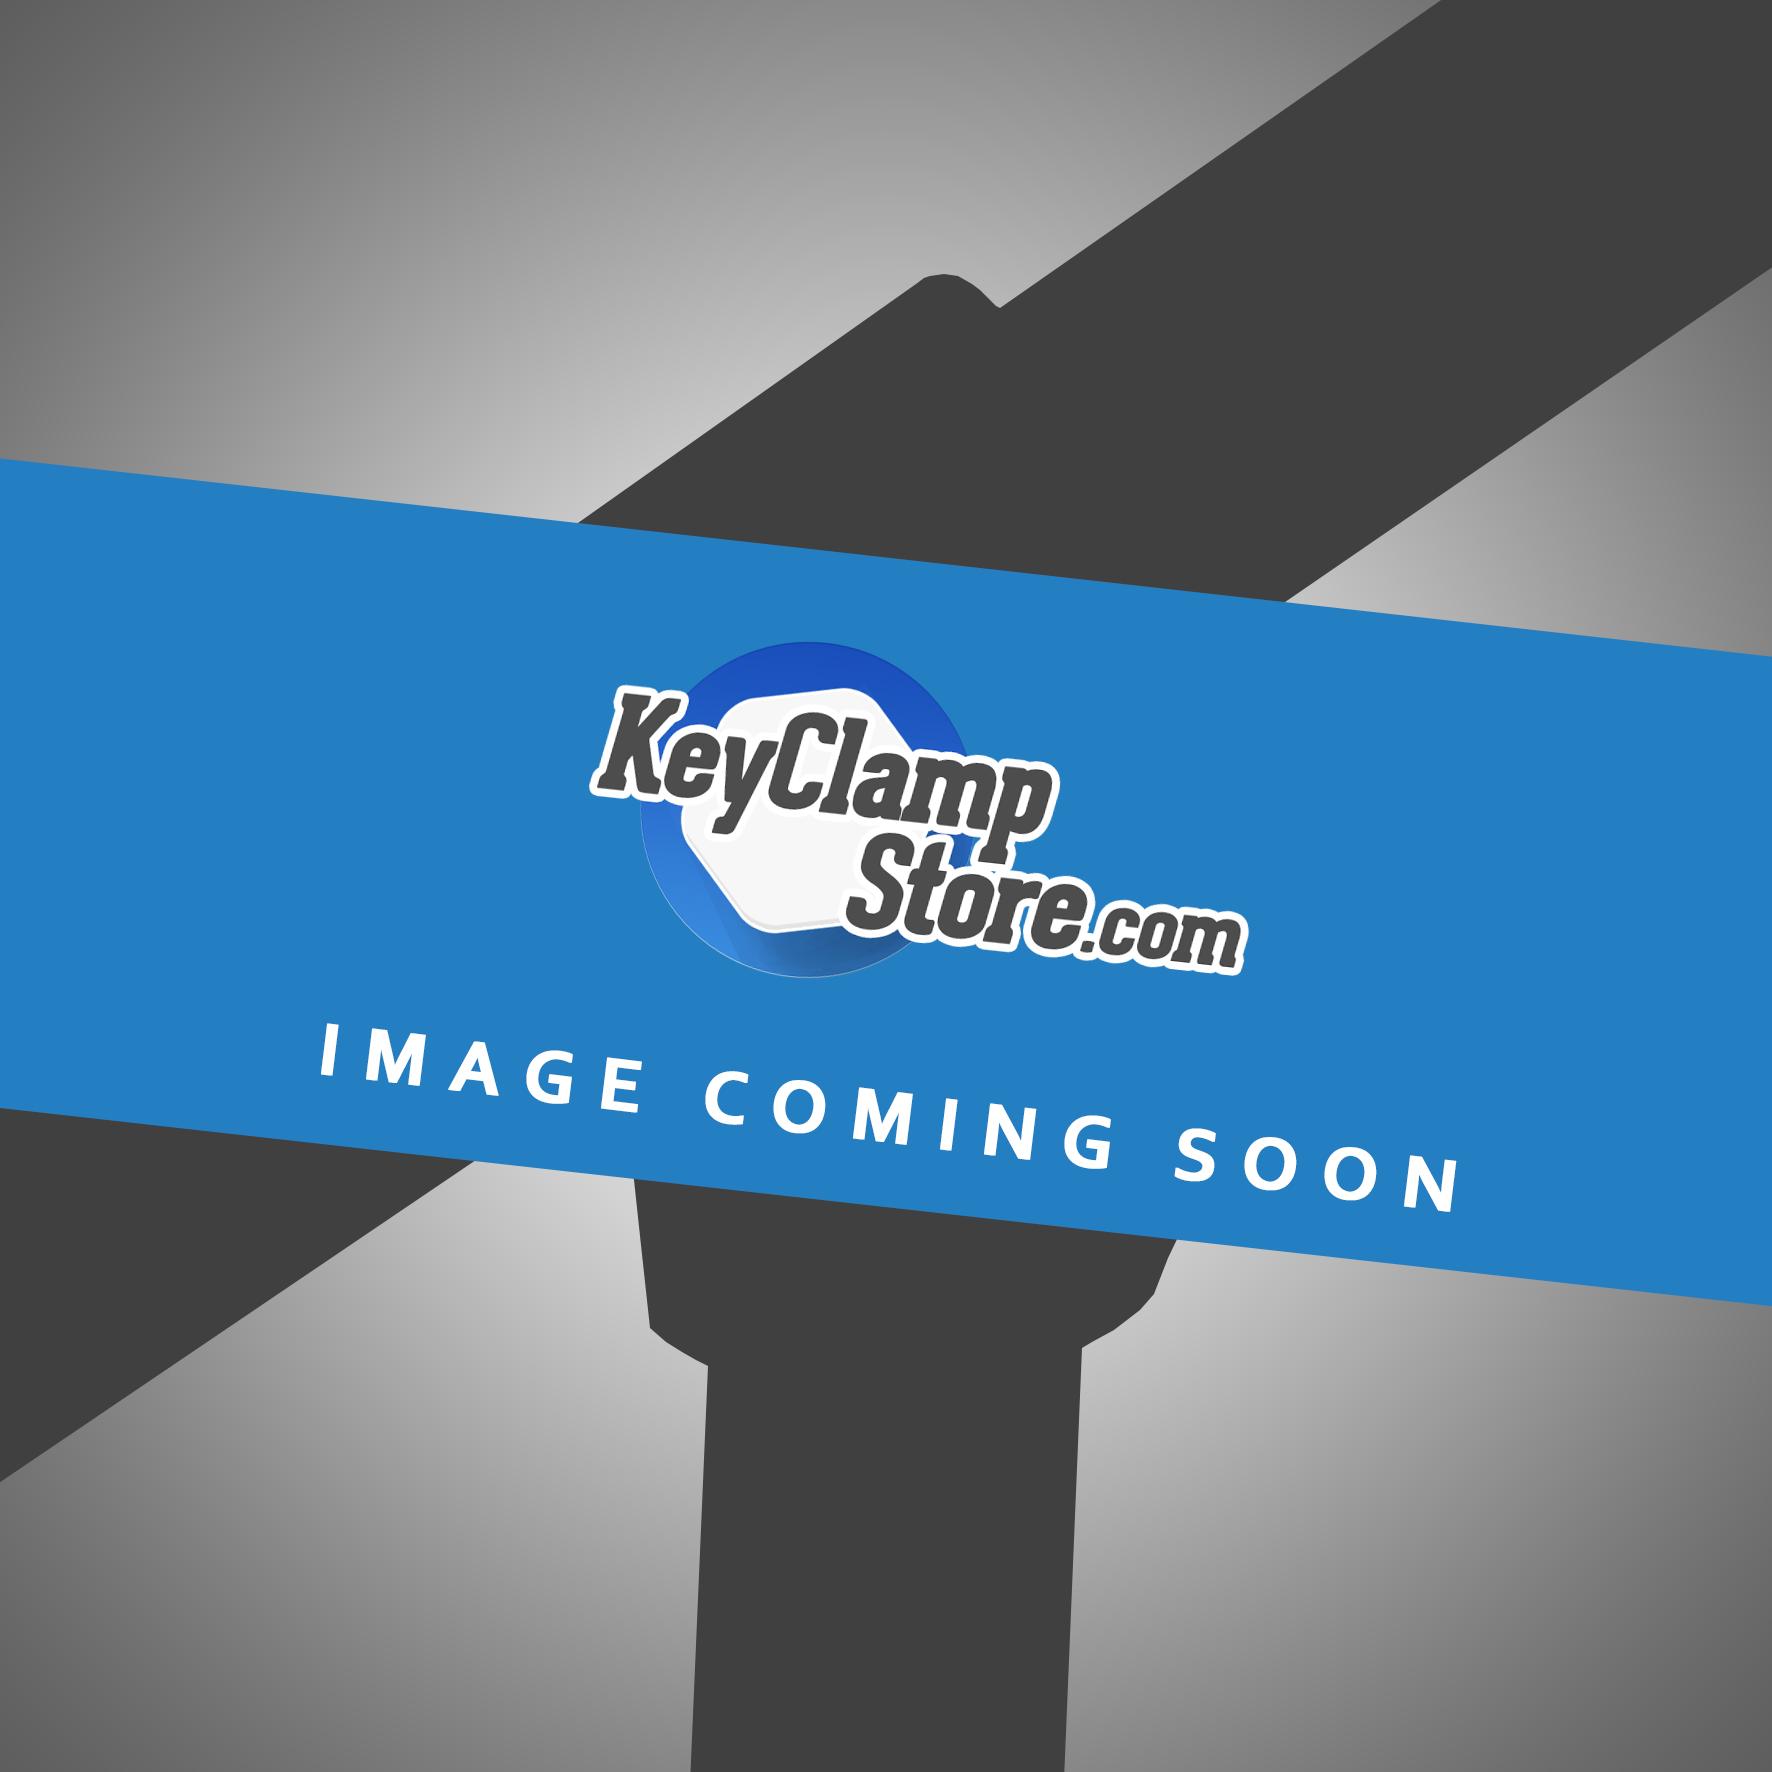 Key Clamp Internal Connector Sleeve 27mm